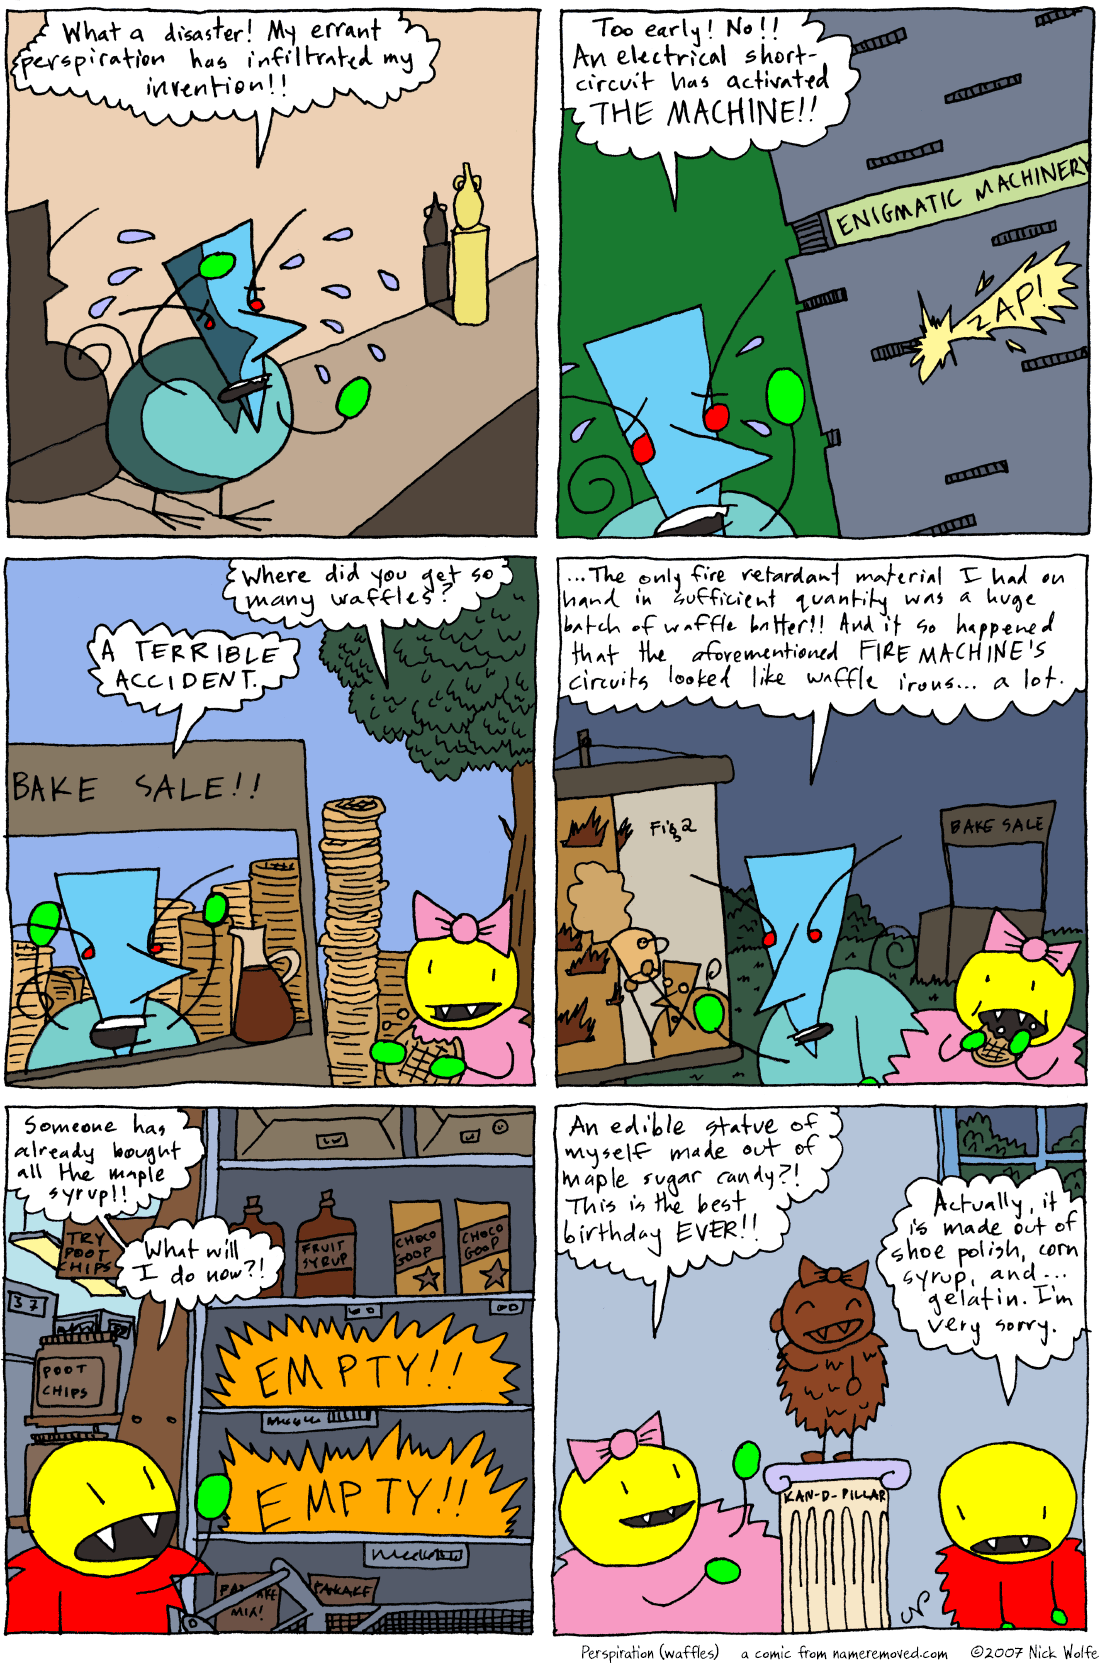 Perspiration (waffles)